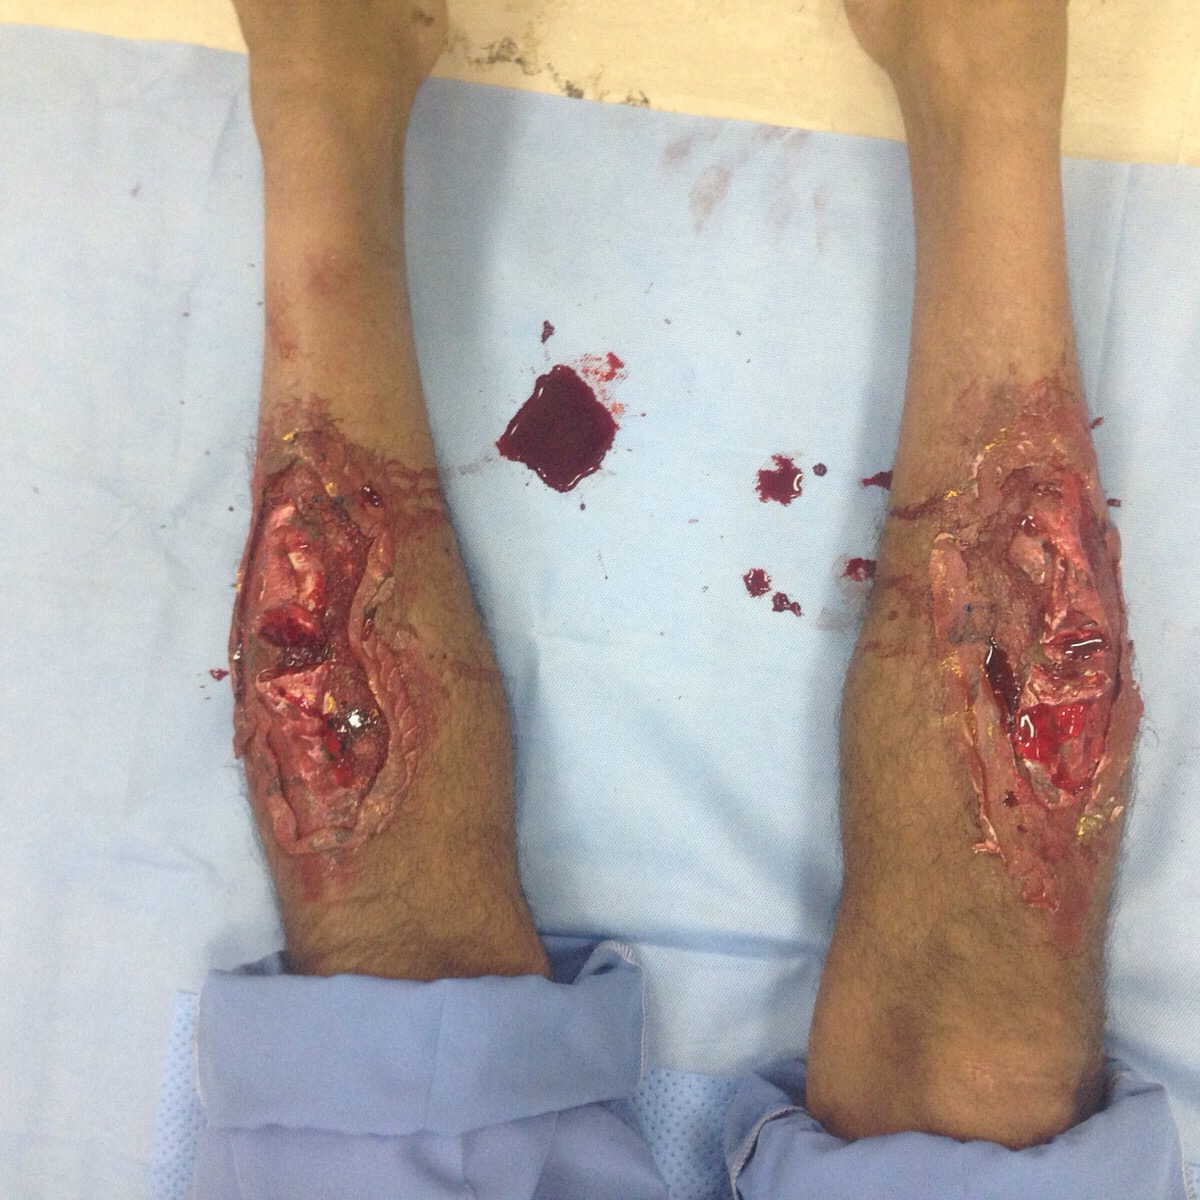 Severe Leg Trauma